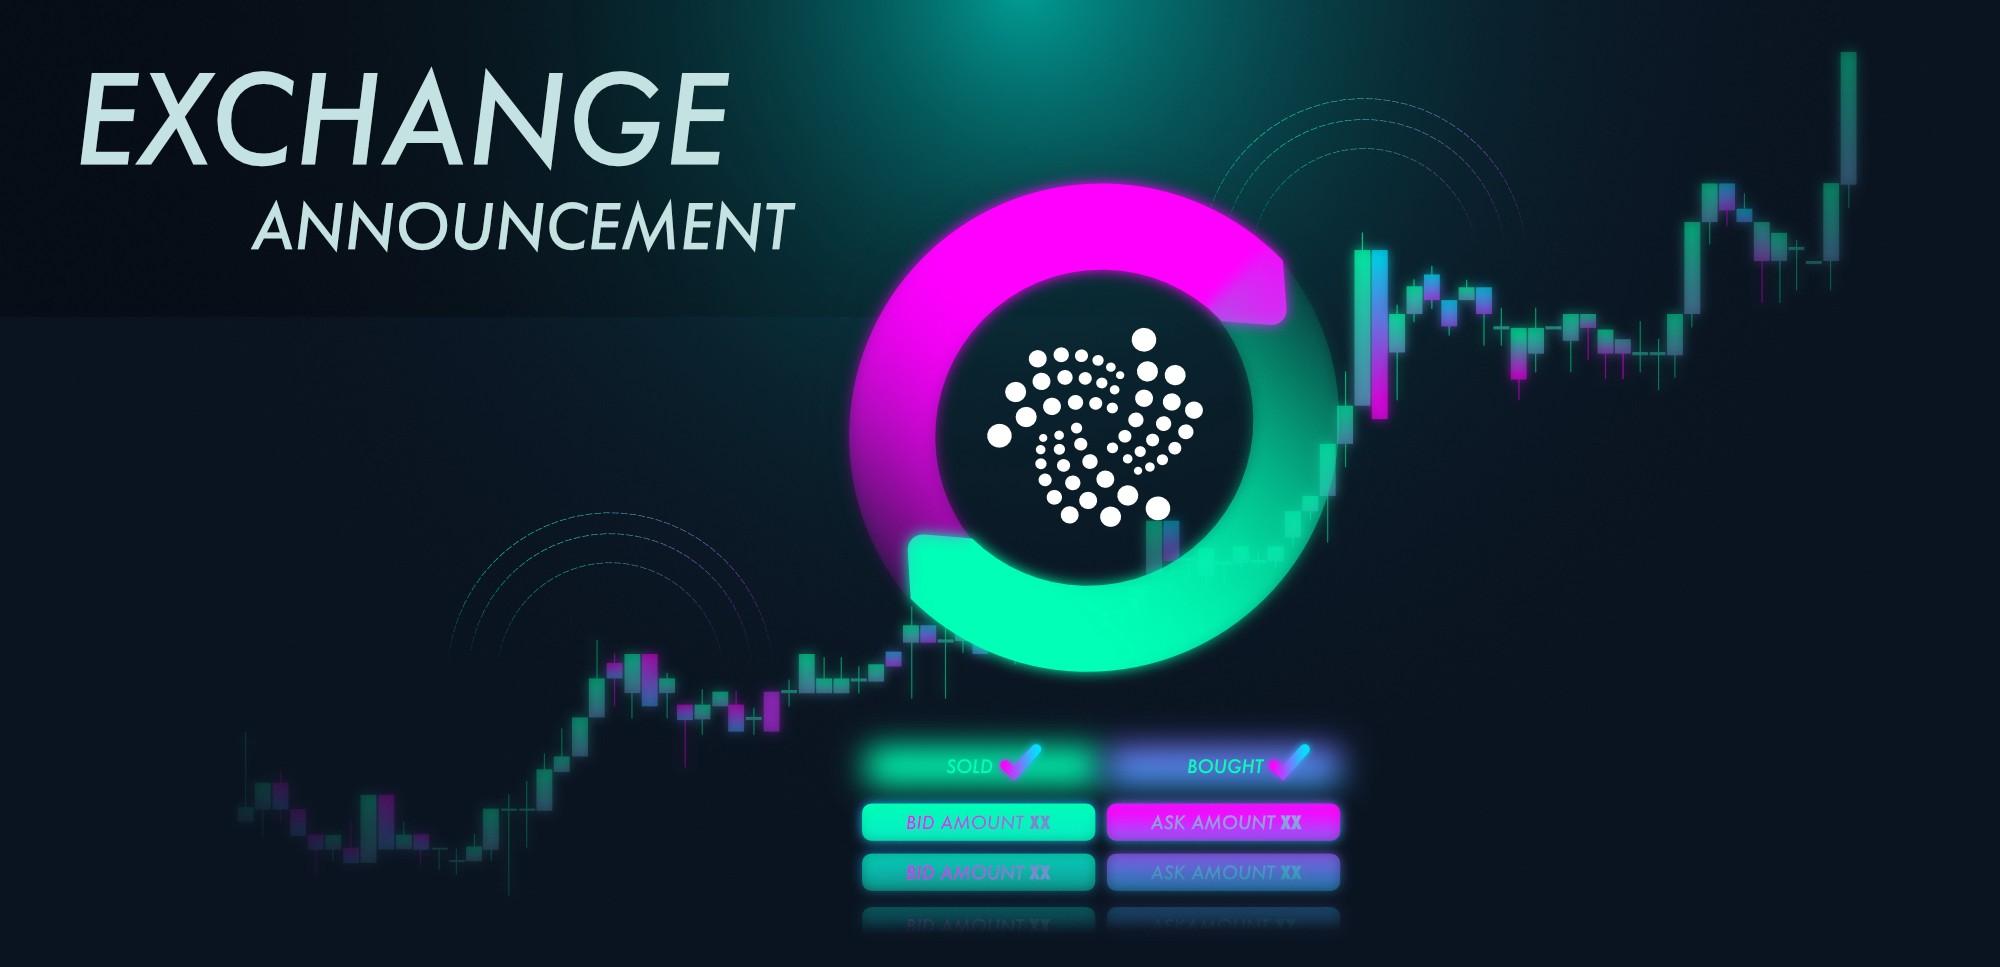 Implementation/docs/wp-content/uploads/2017/06/iota-trading-announcement.jpeg